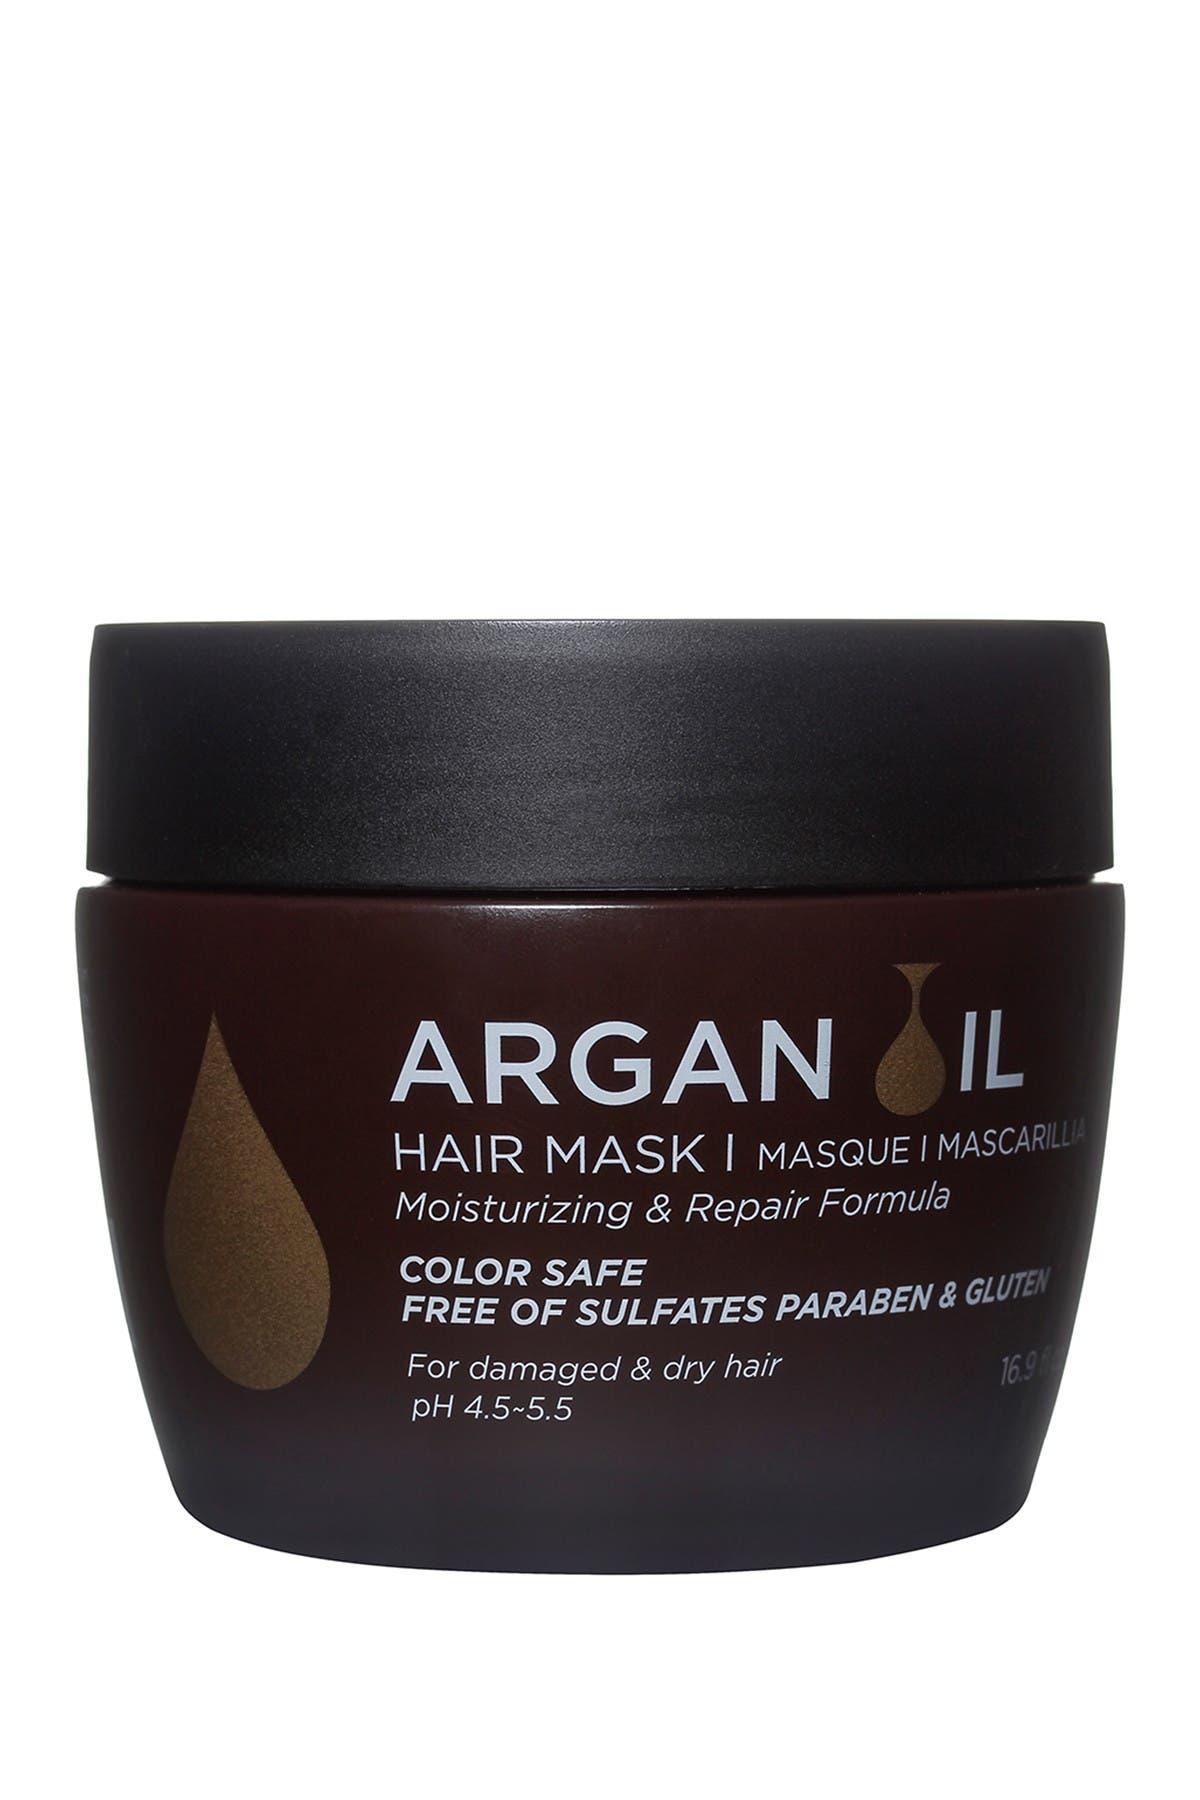 Image of Luseta Beauty Argan Oil Hair Mask - 16.9 oz.